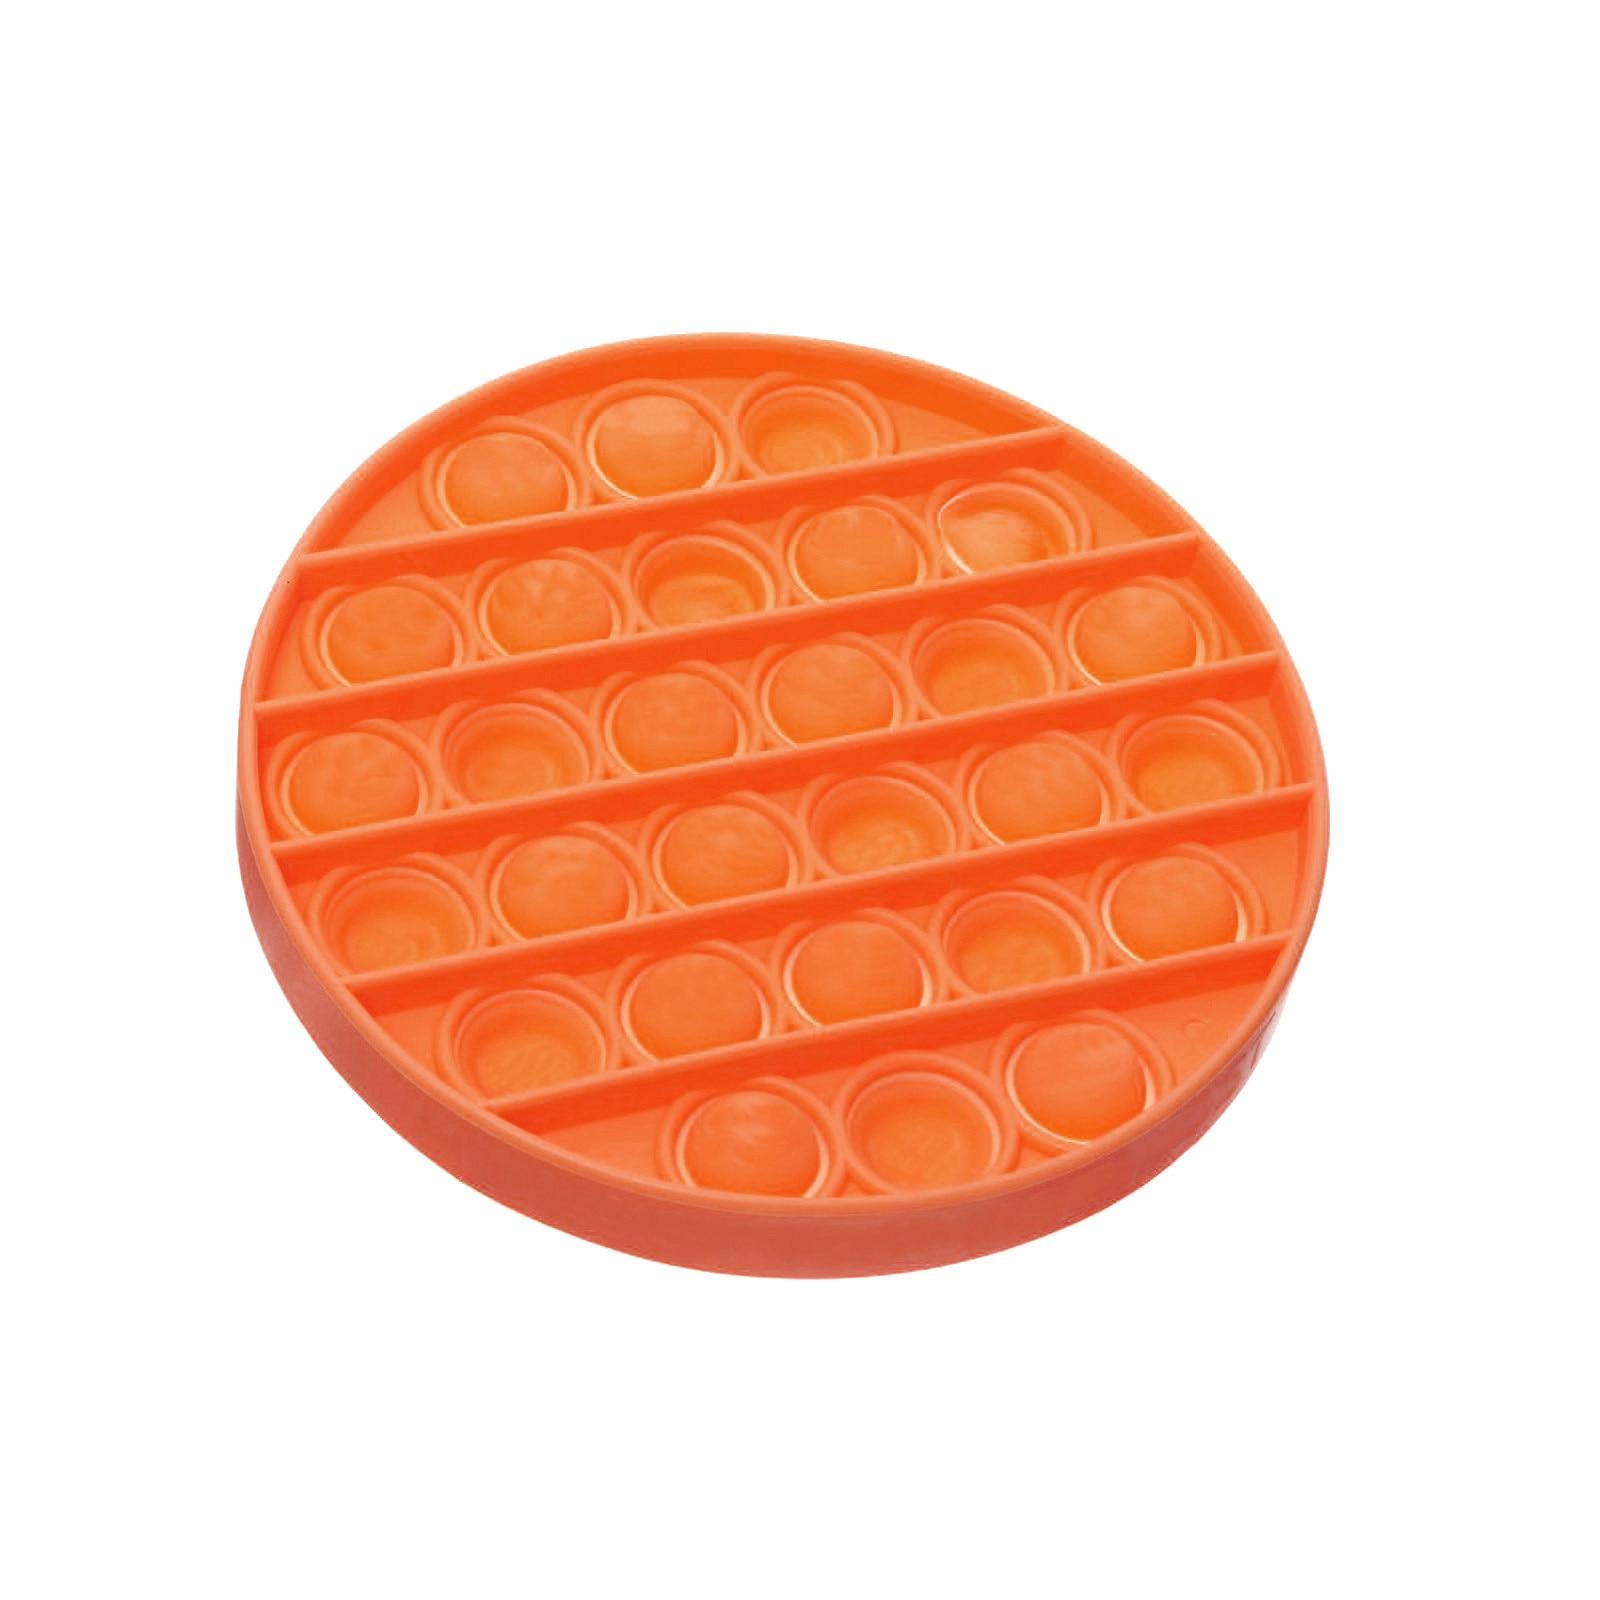 Antistress-Toys Fidget-Sensory-Toy Bubble-Fidget Pops Carrot Adult Kids 1pc Autism New img2